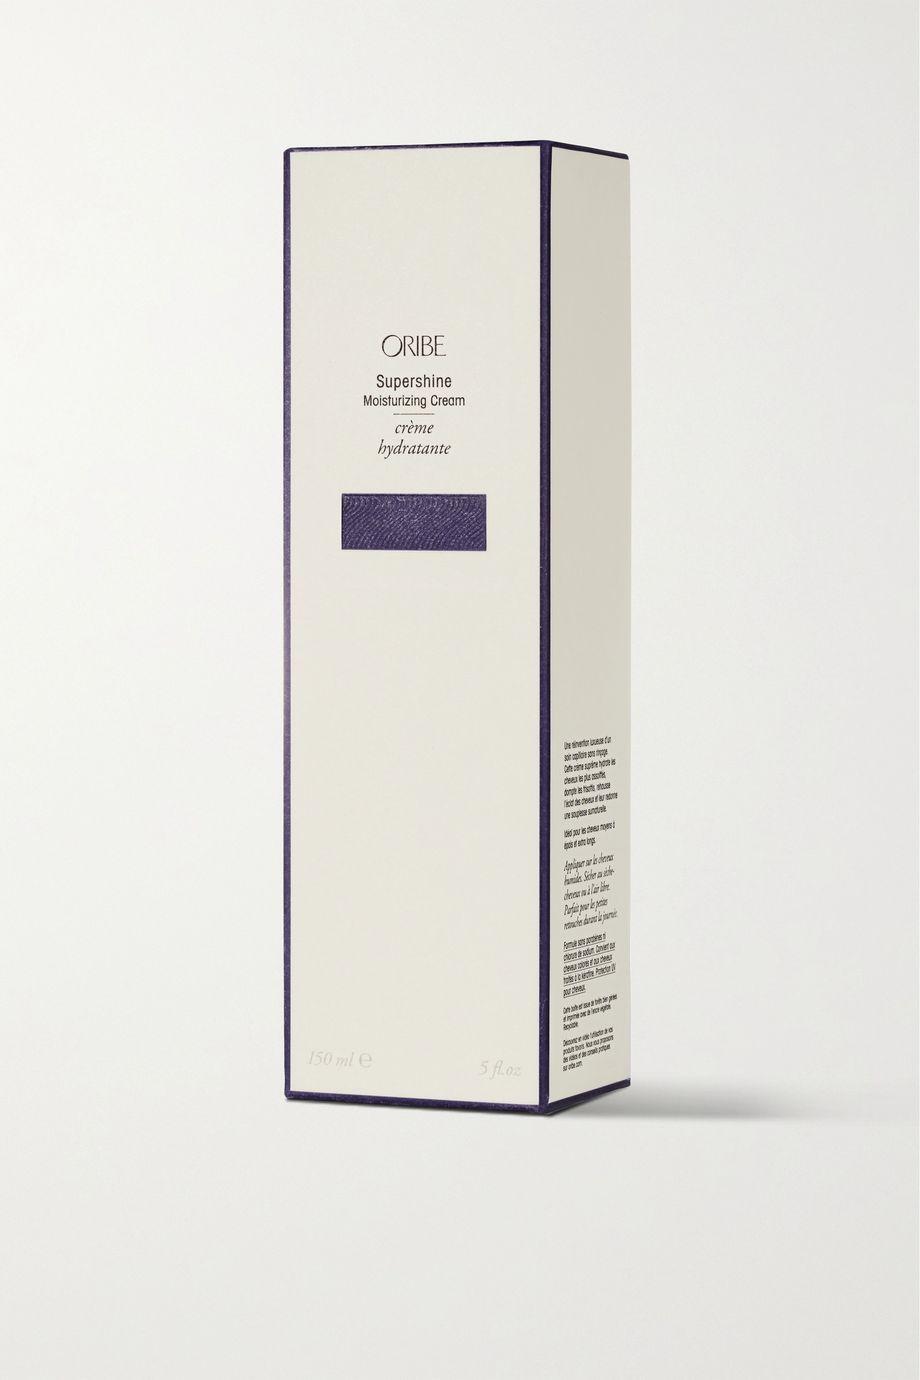 Oribe Supershine Moisturizing Cream, 150ml